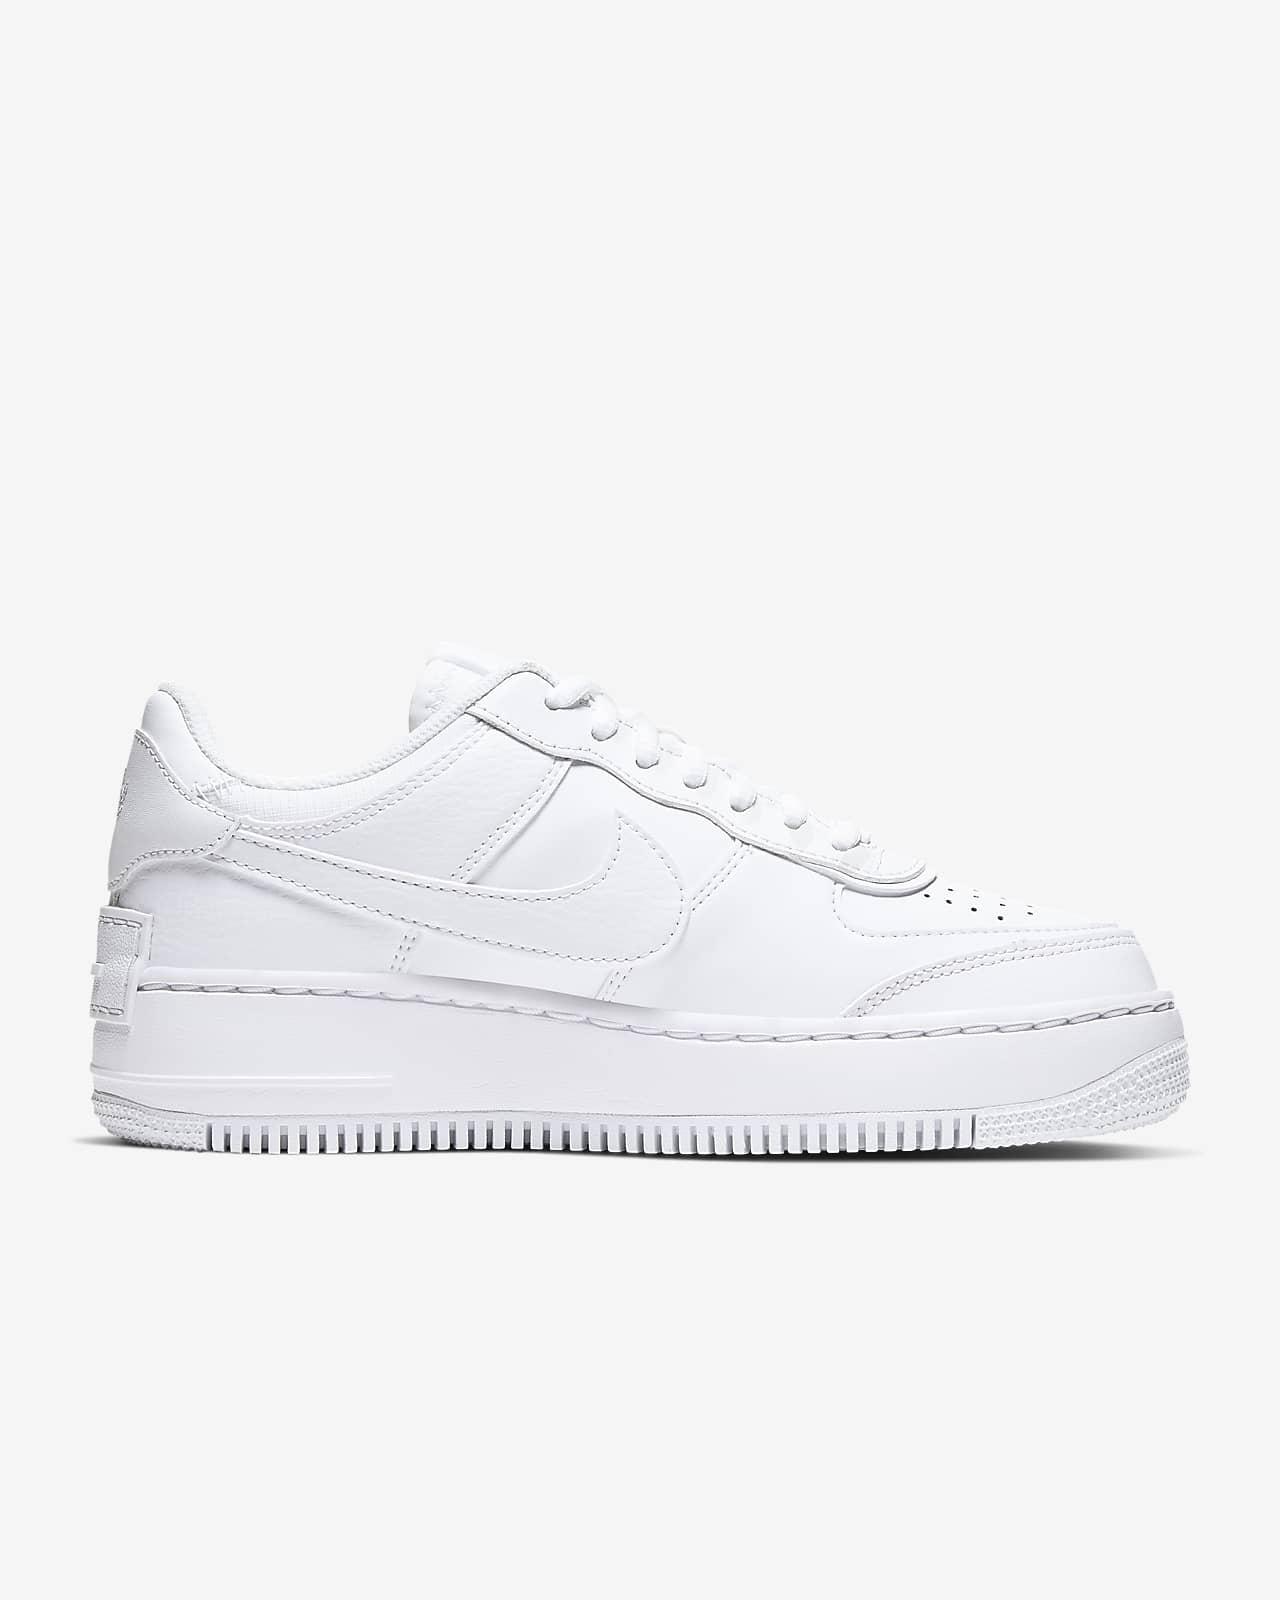 Burro más y más crimen  Nike Air Force 1 Shadow Women's Shoe. Nike AT